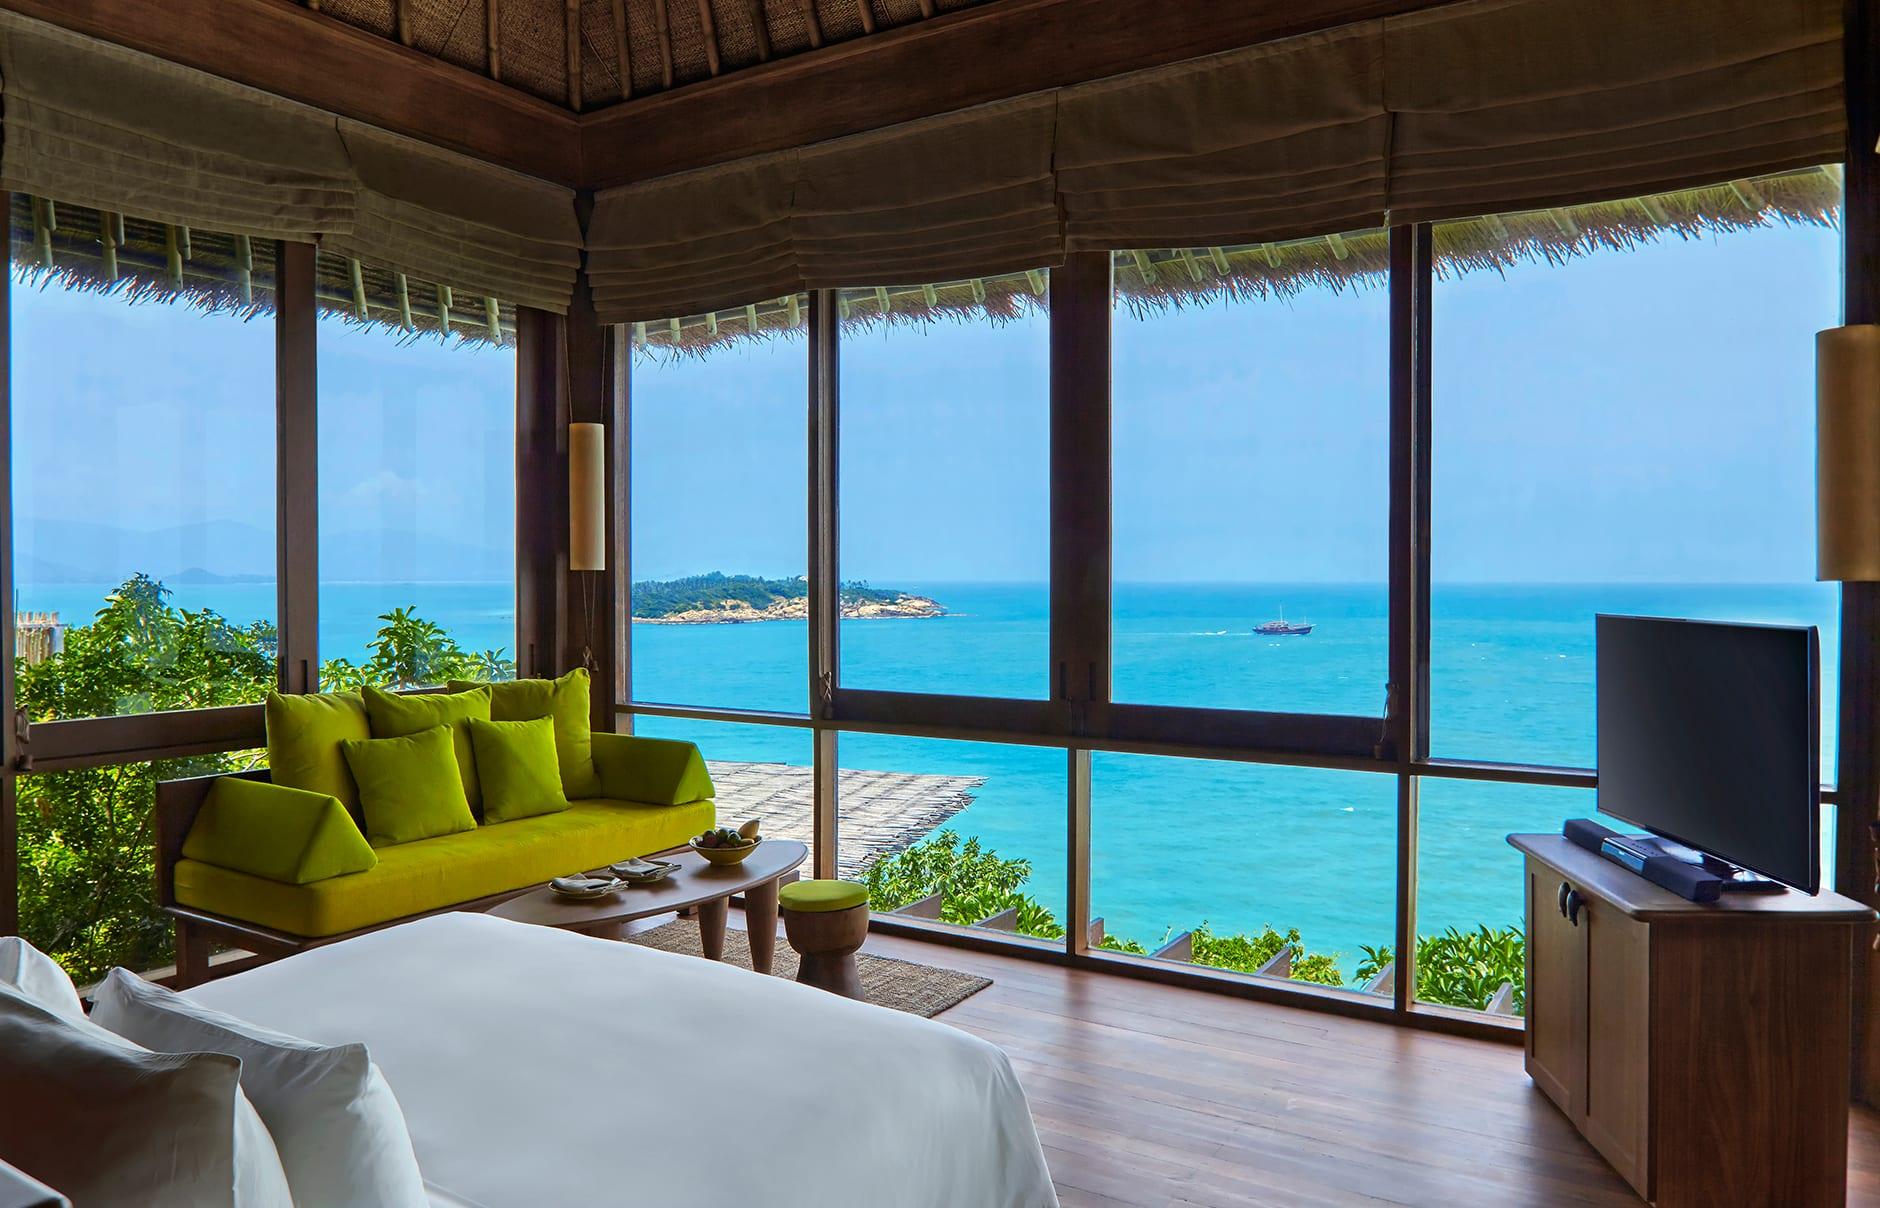 The Retreat. Six Senses Samui, Thailand. © Six Senses Resorts & Spas